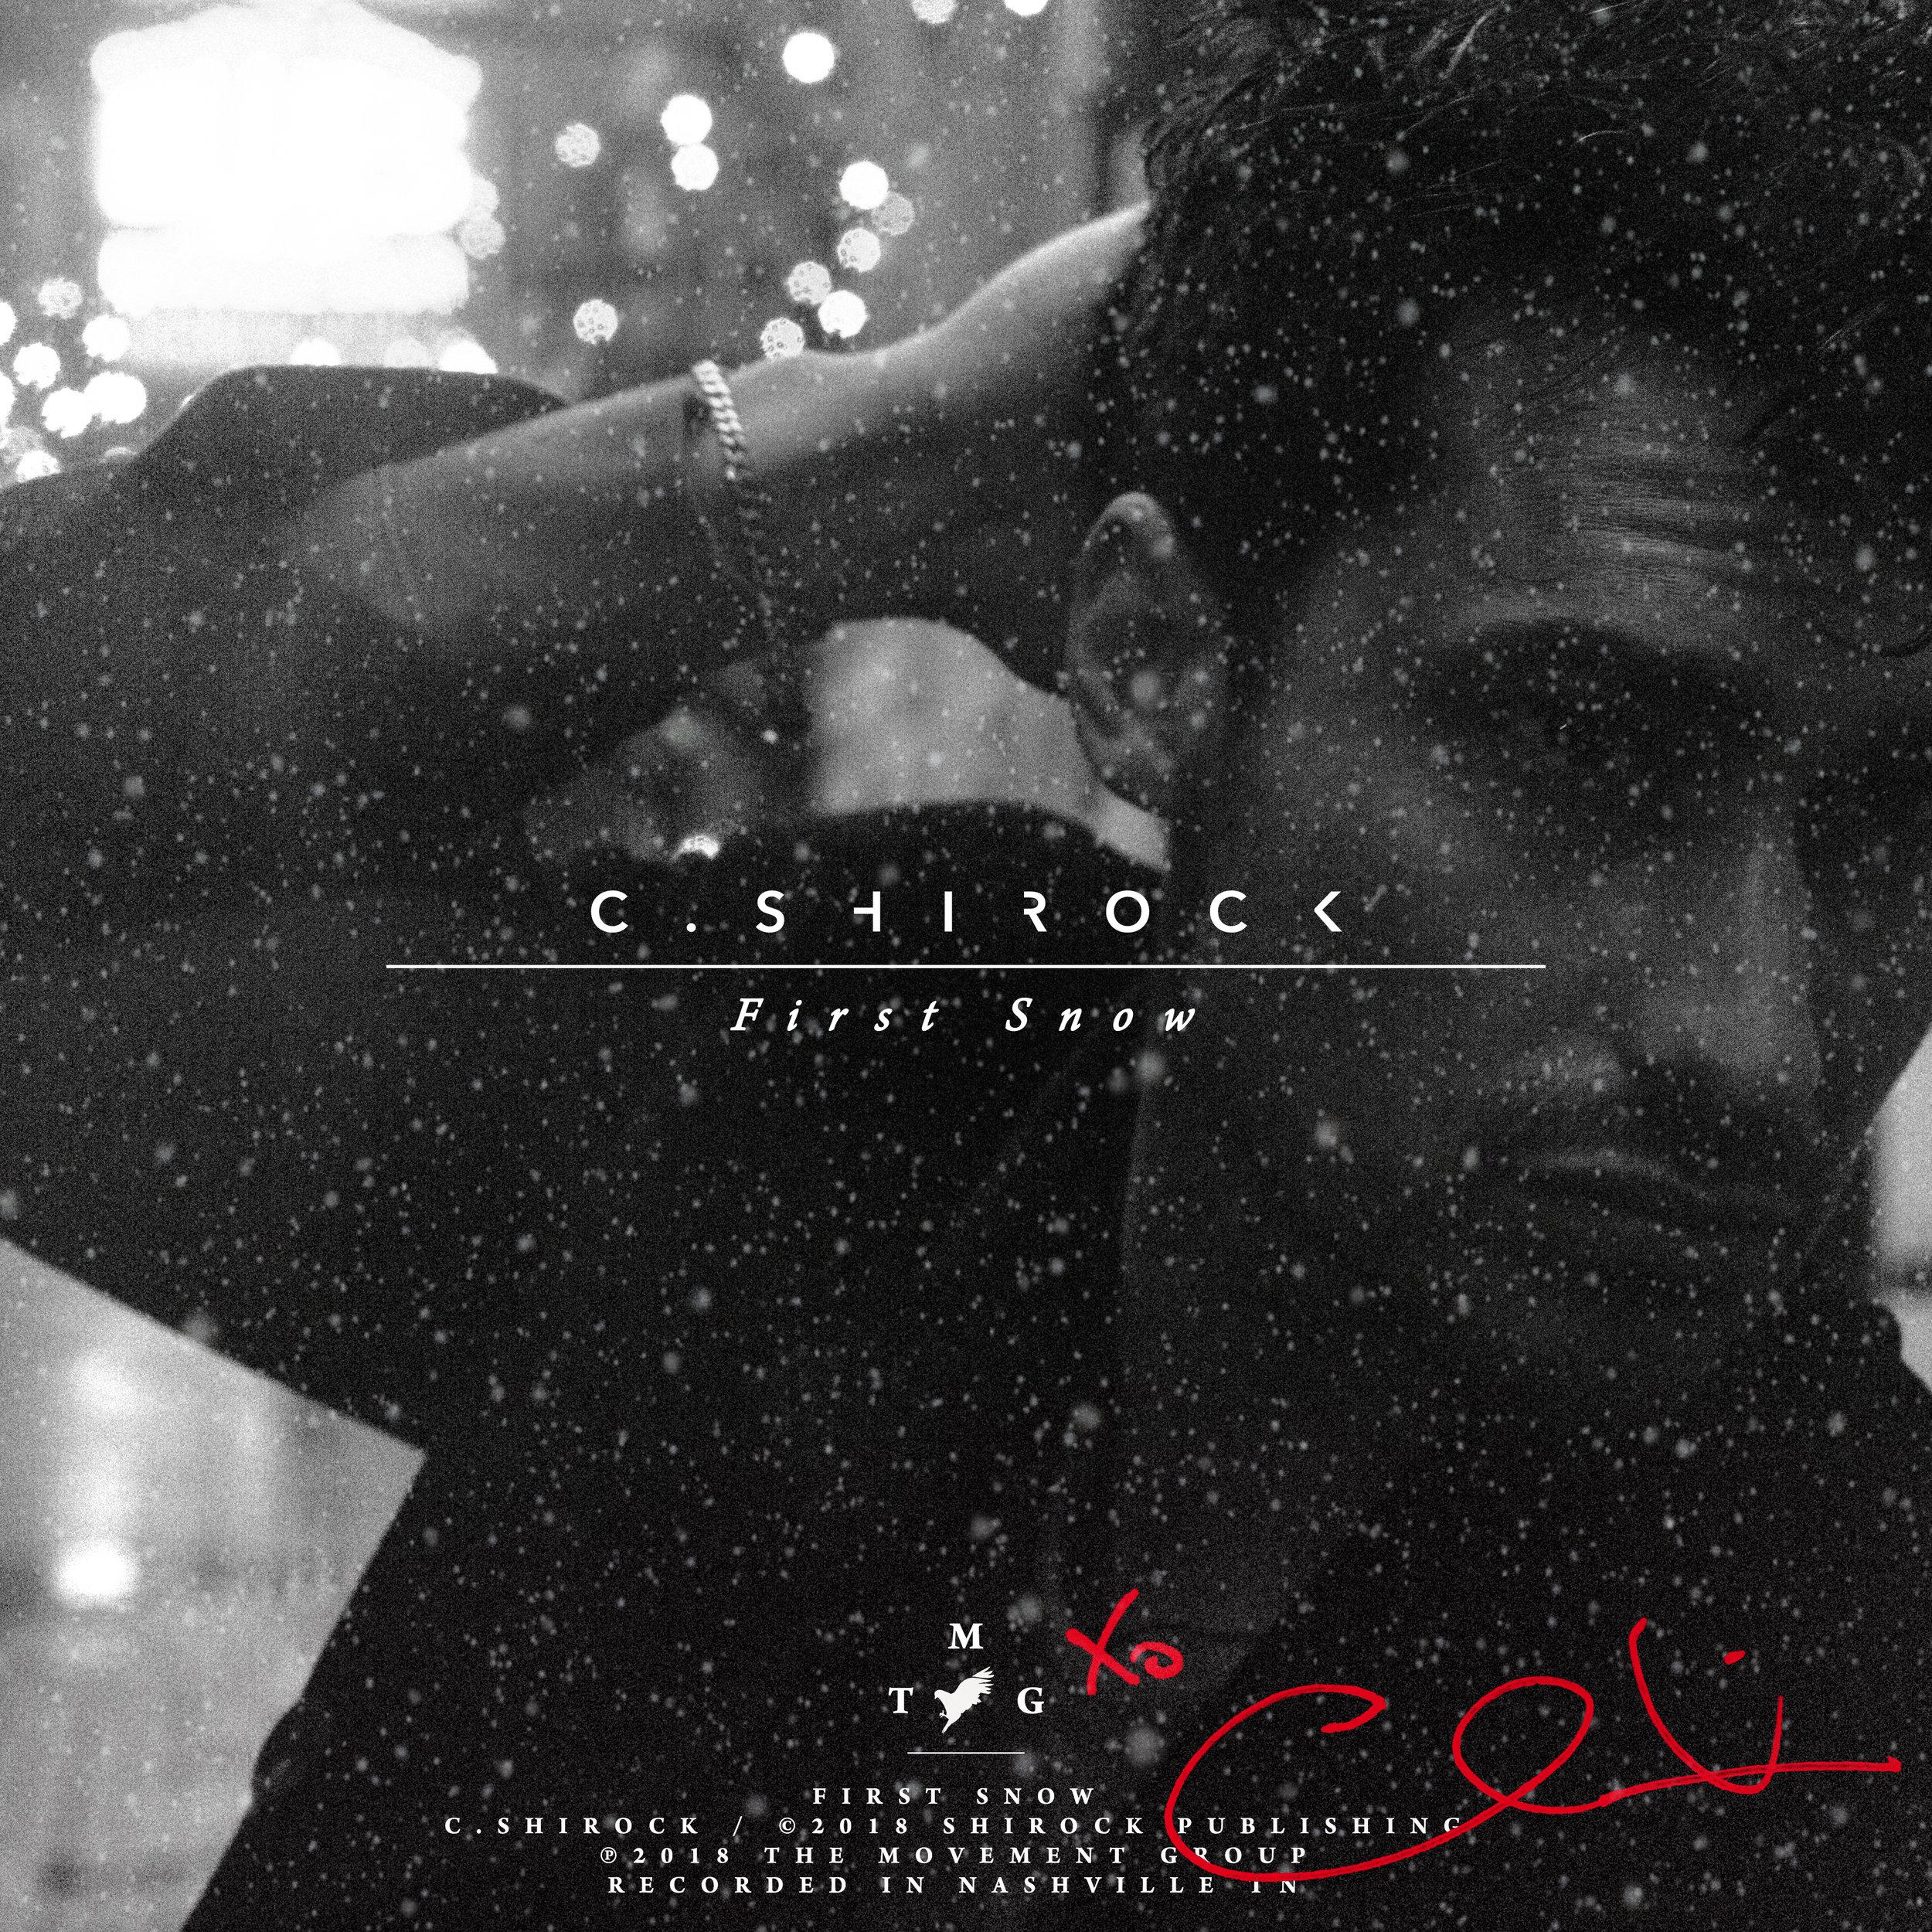 C. SHIROCK - First Snow.jpg